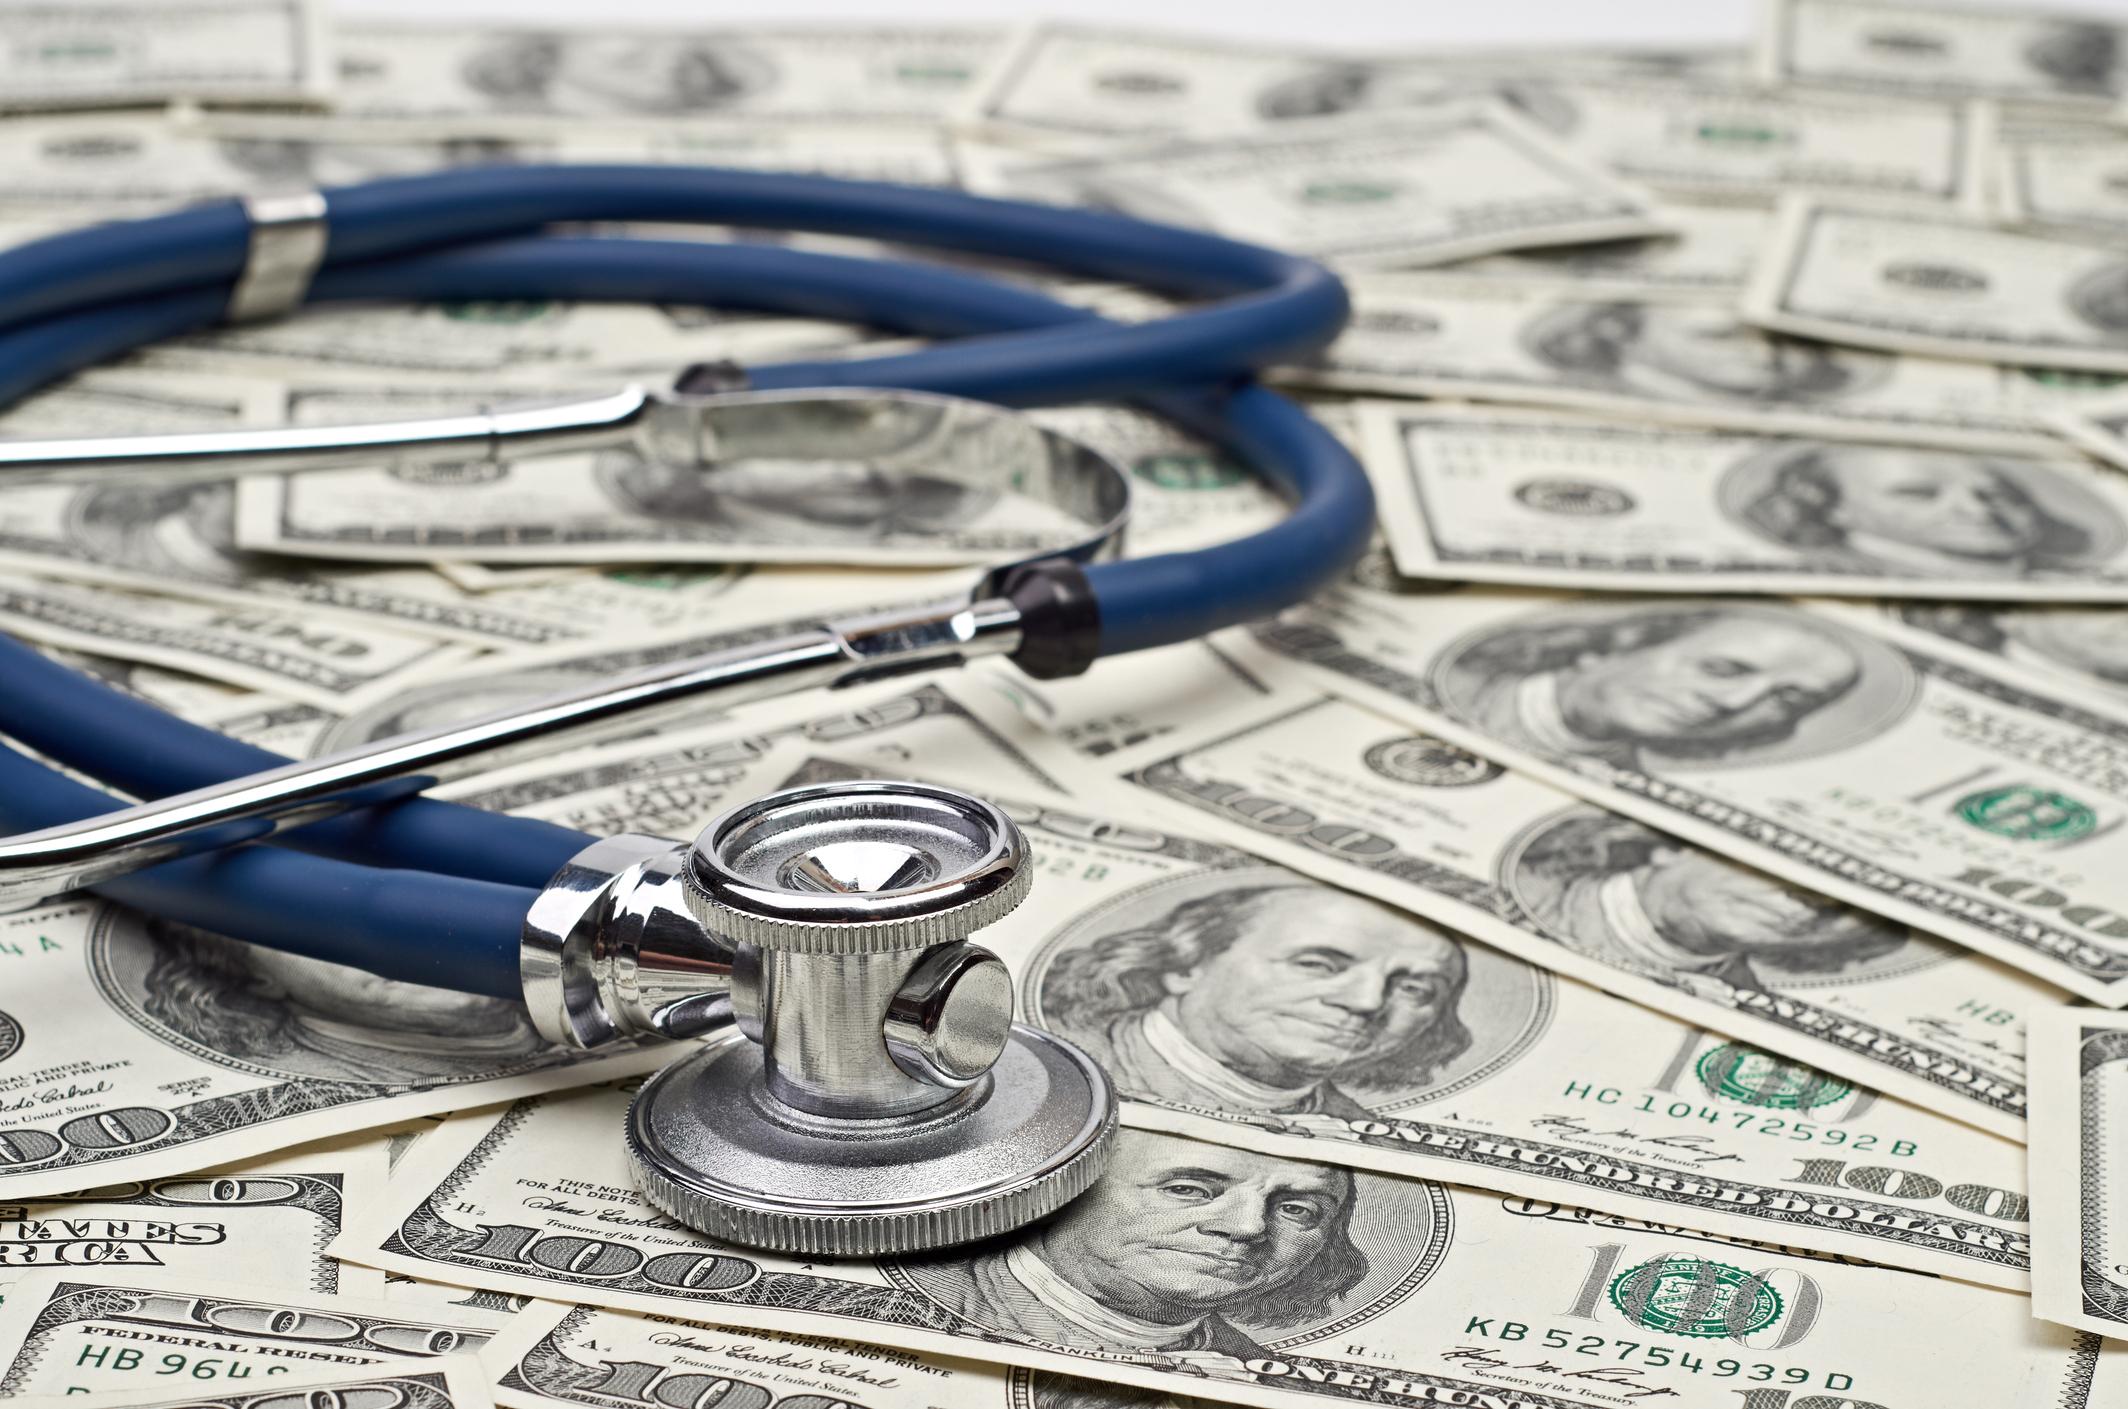 A blue stethoscope atop hundred dollar bills.